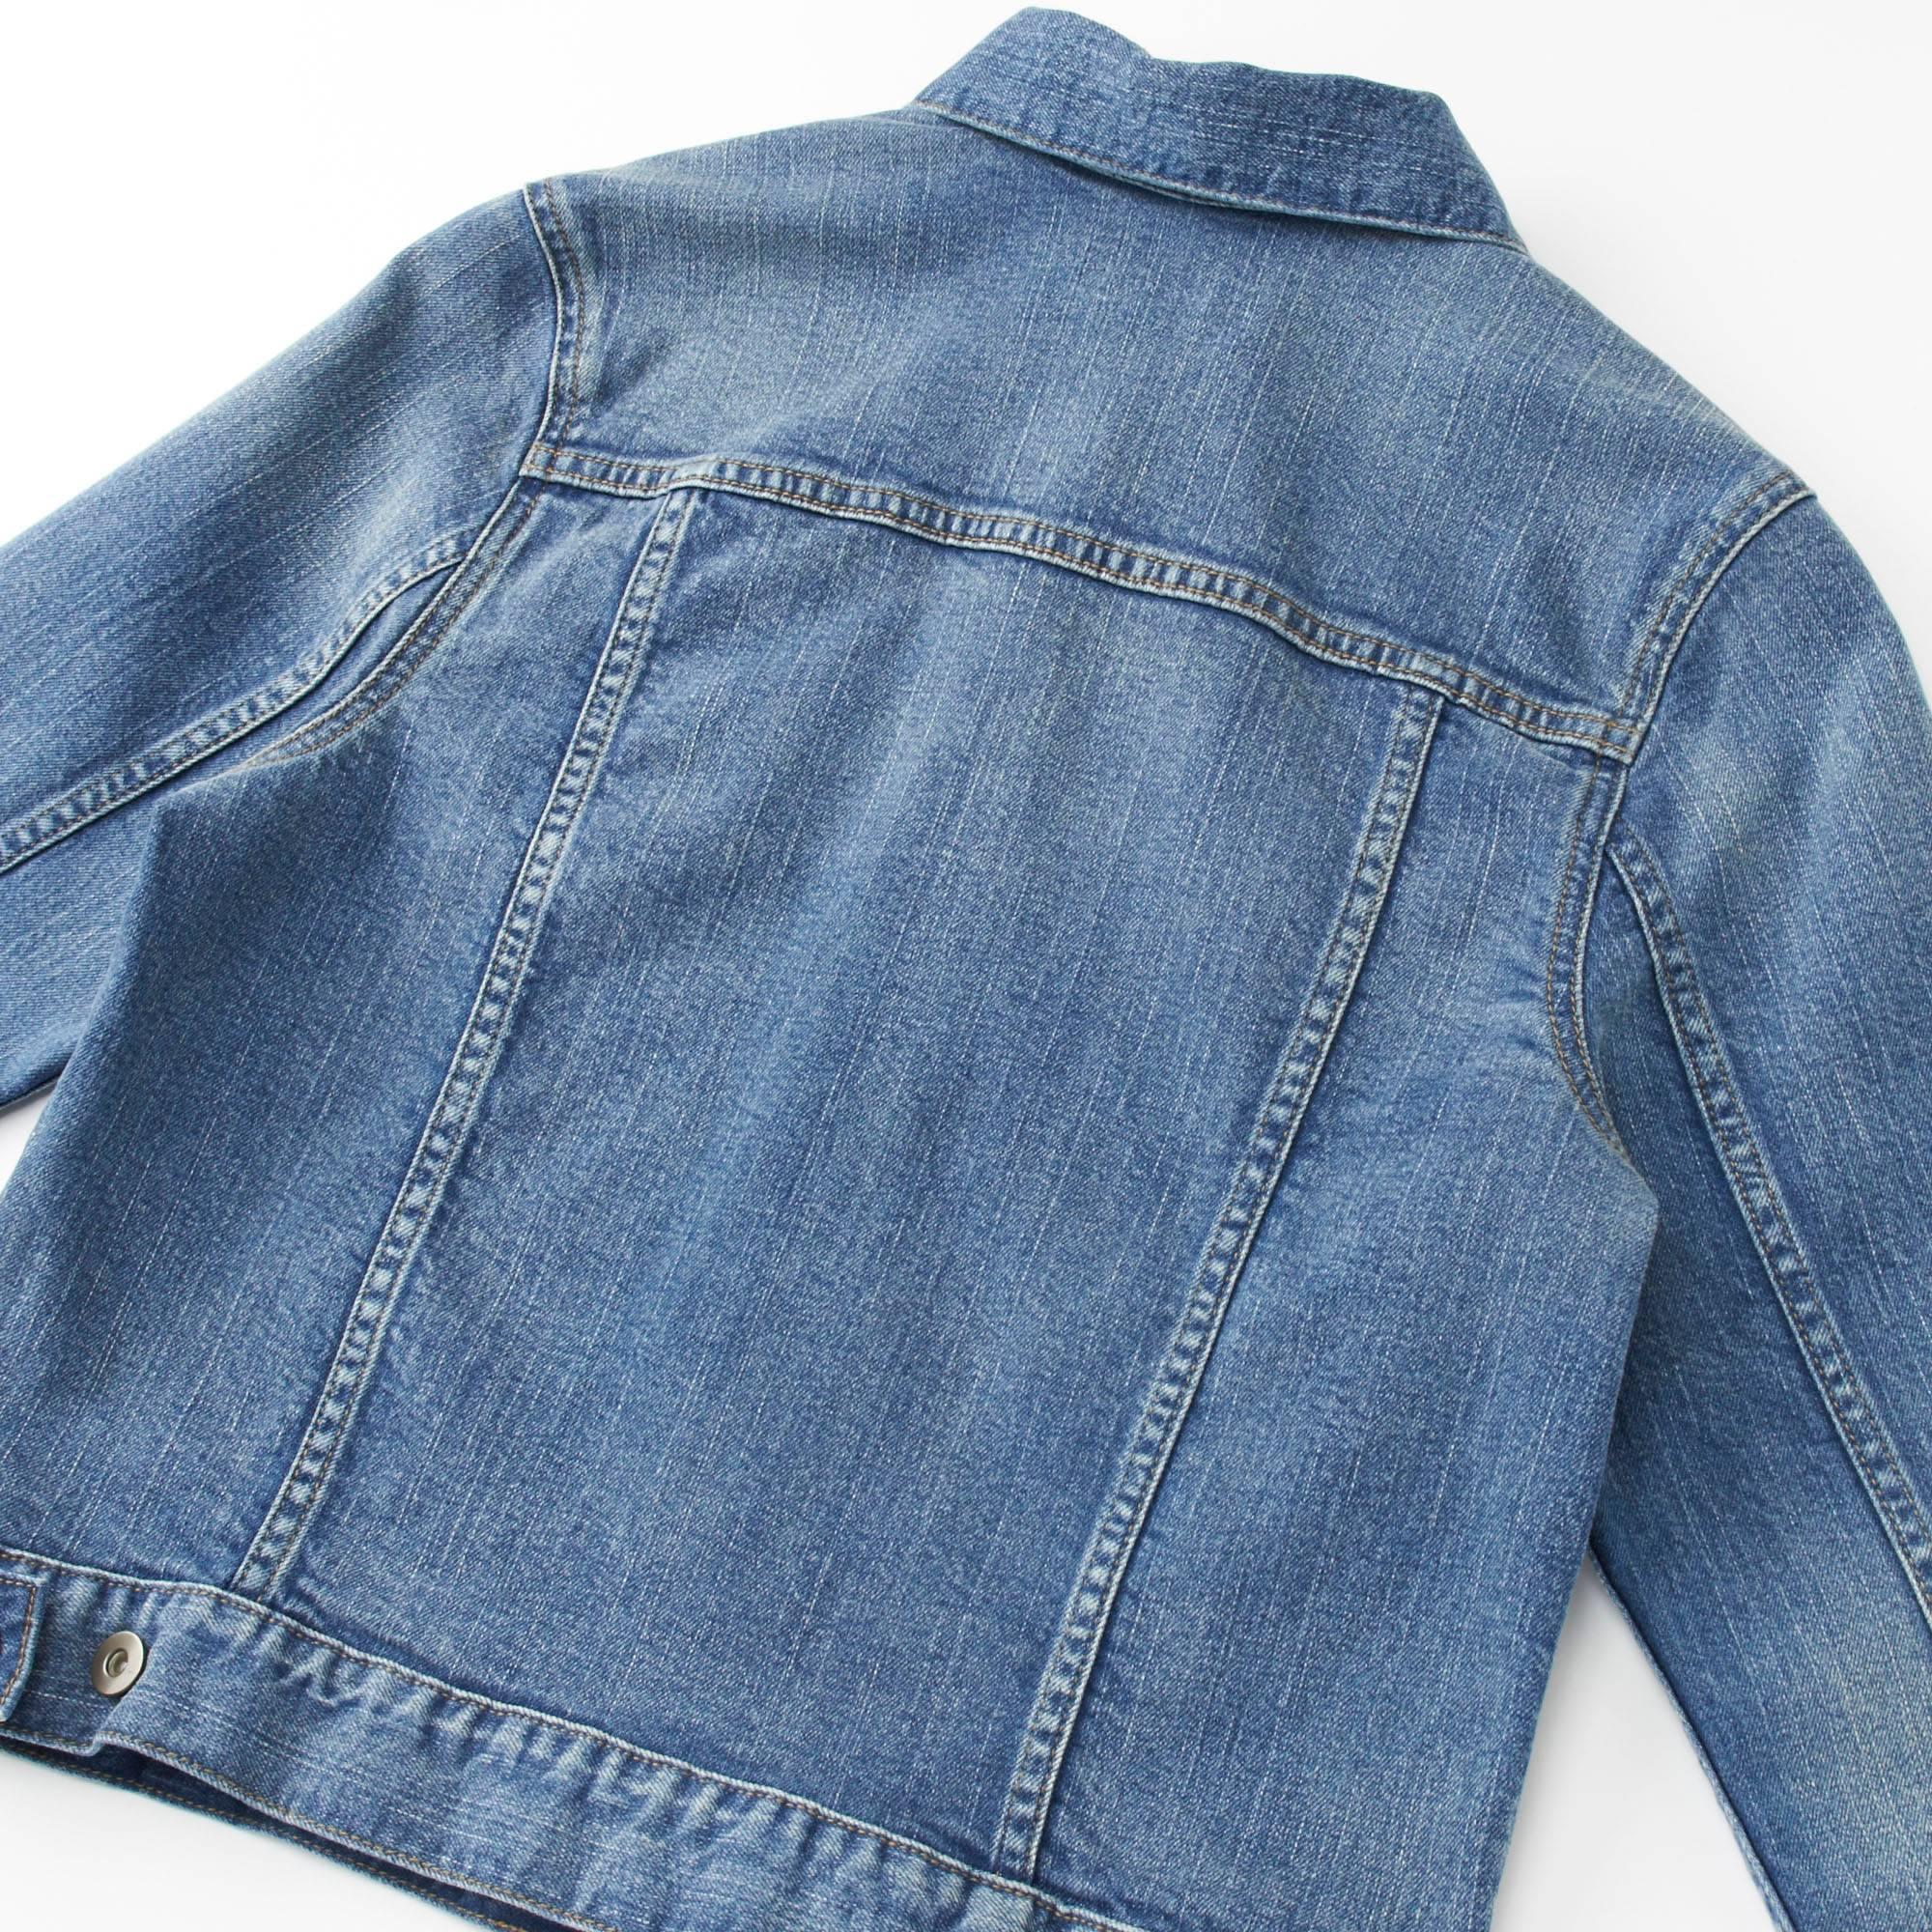 denim jackets for women women denim jacket, blue, small GKZGARZ